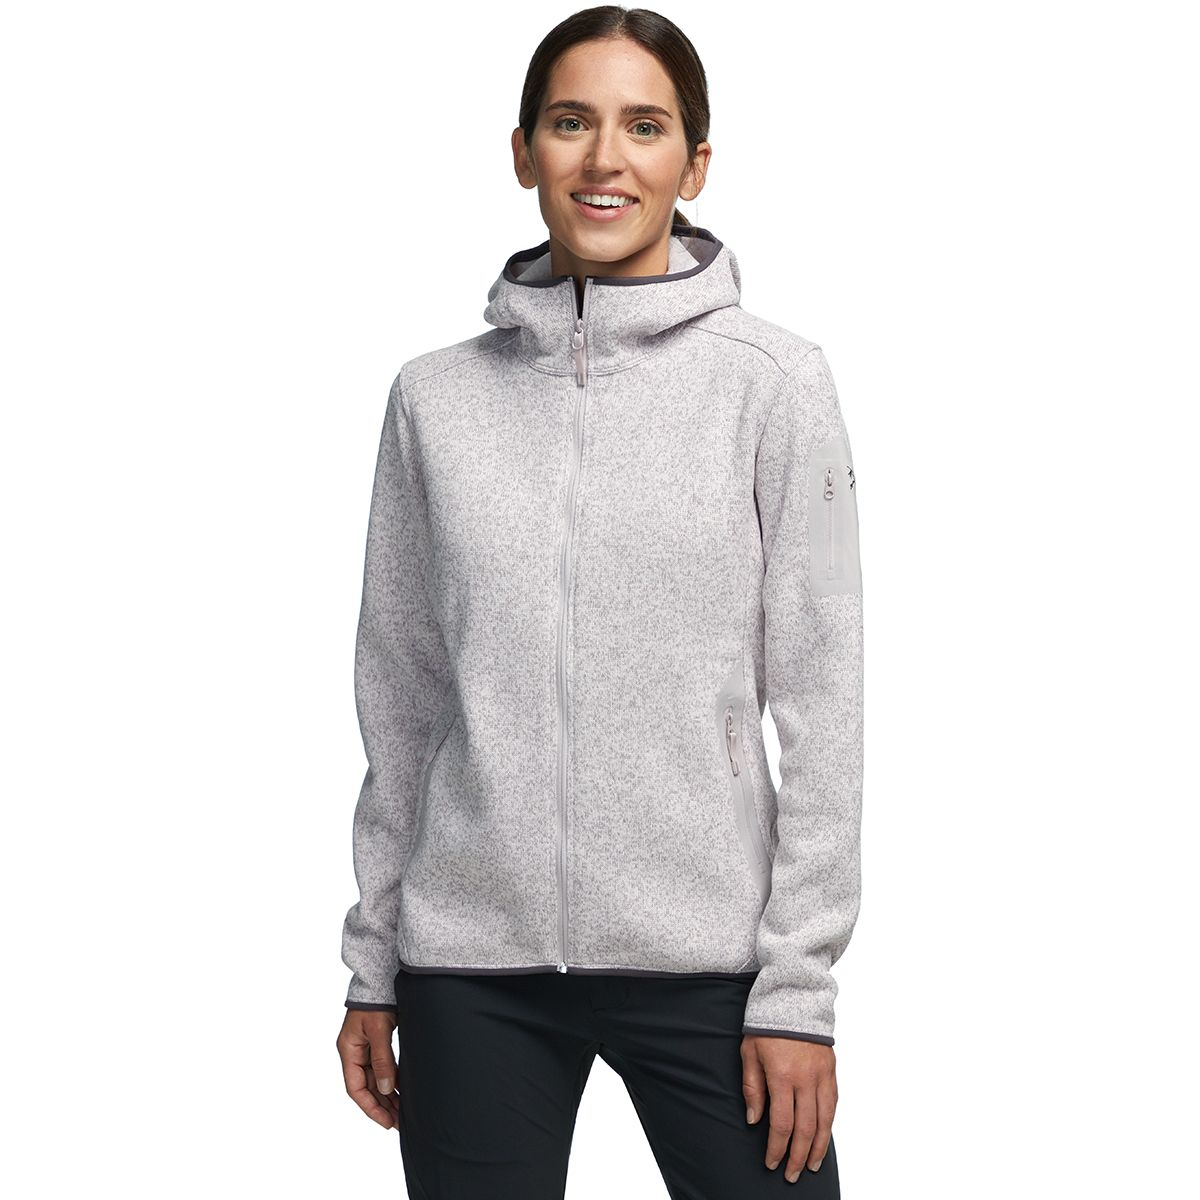 Covert Hooded Fleece Jacket - Women